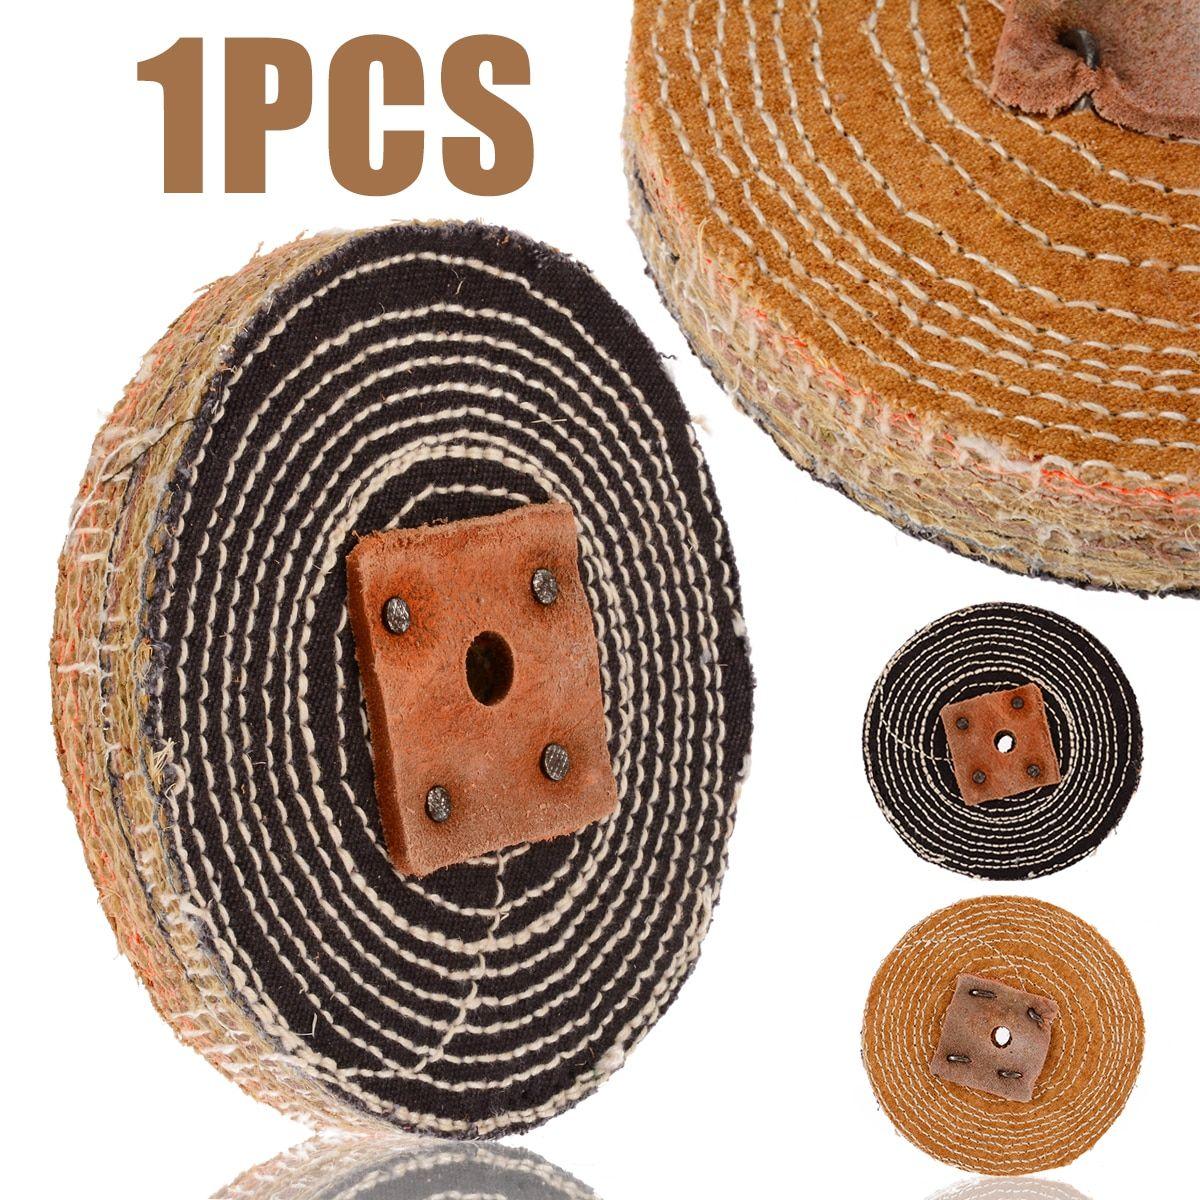 6 Inch 10 Pcs Sisal Cloth Buffing Wheel For Stainless Steel Metal Polishing Tool